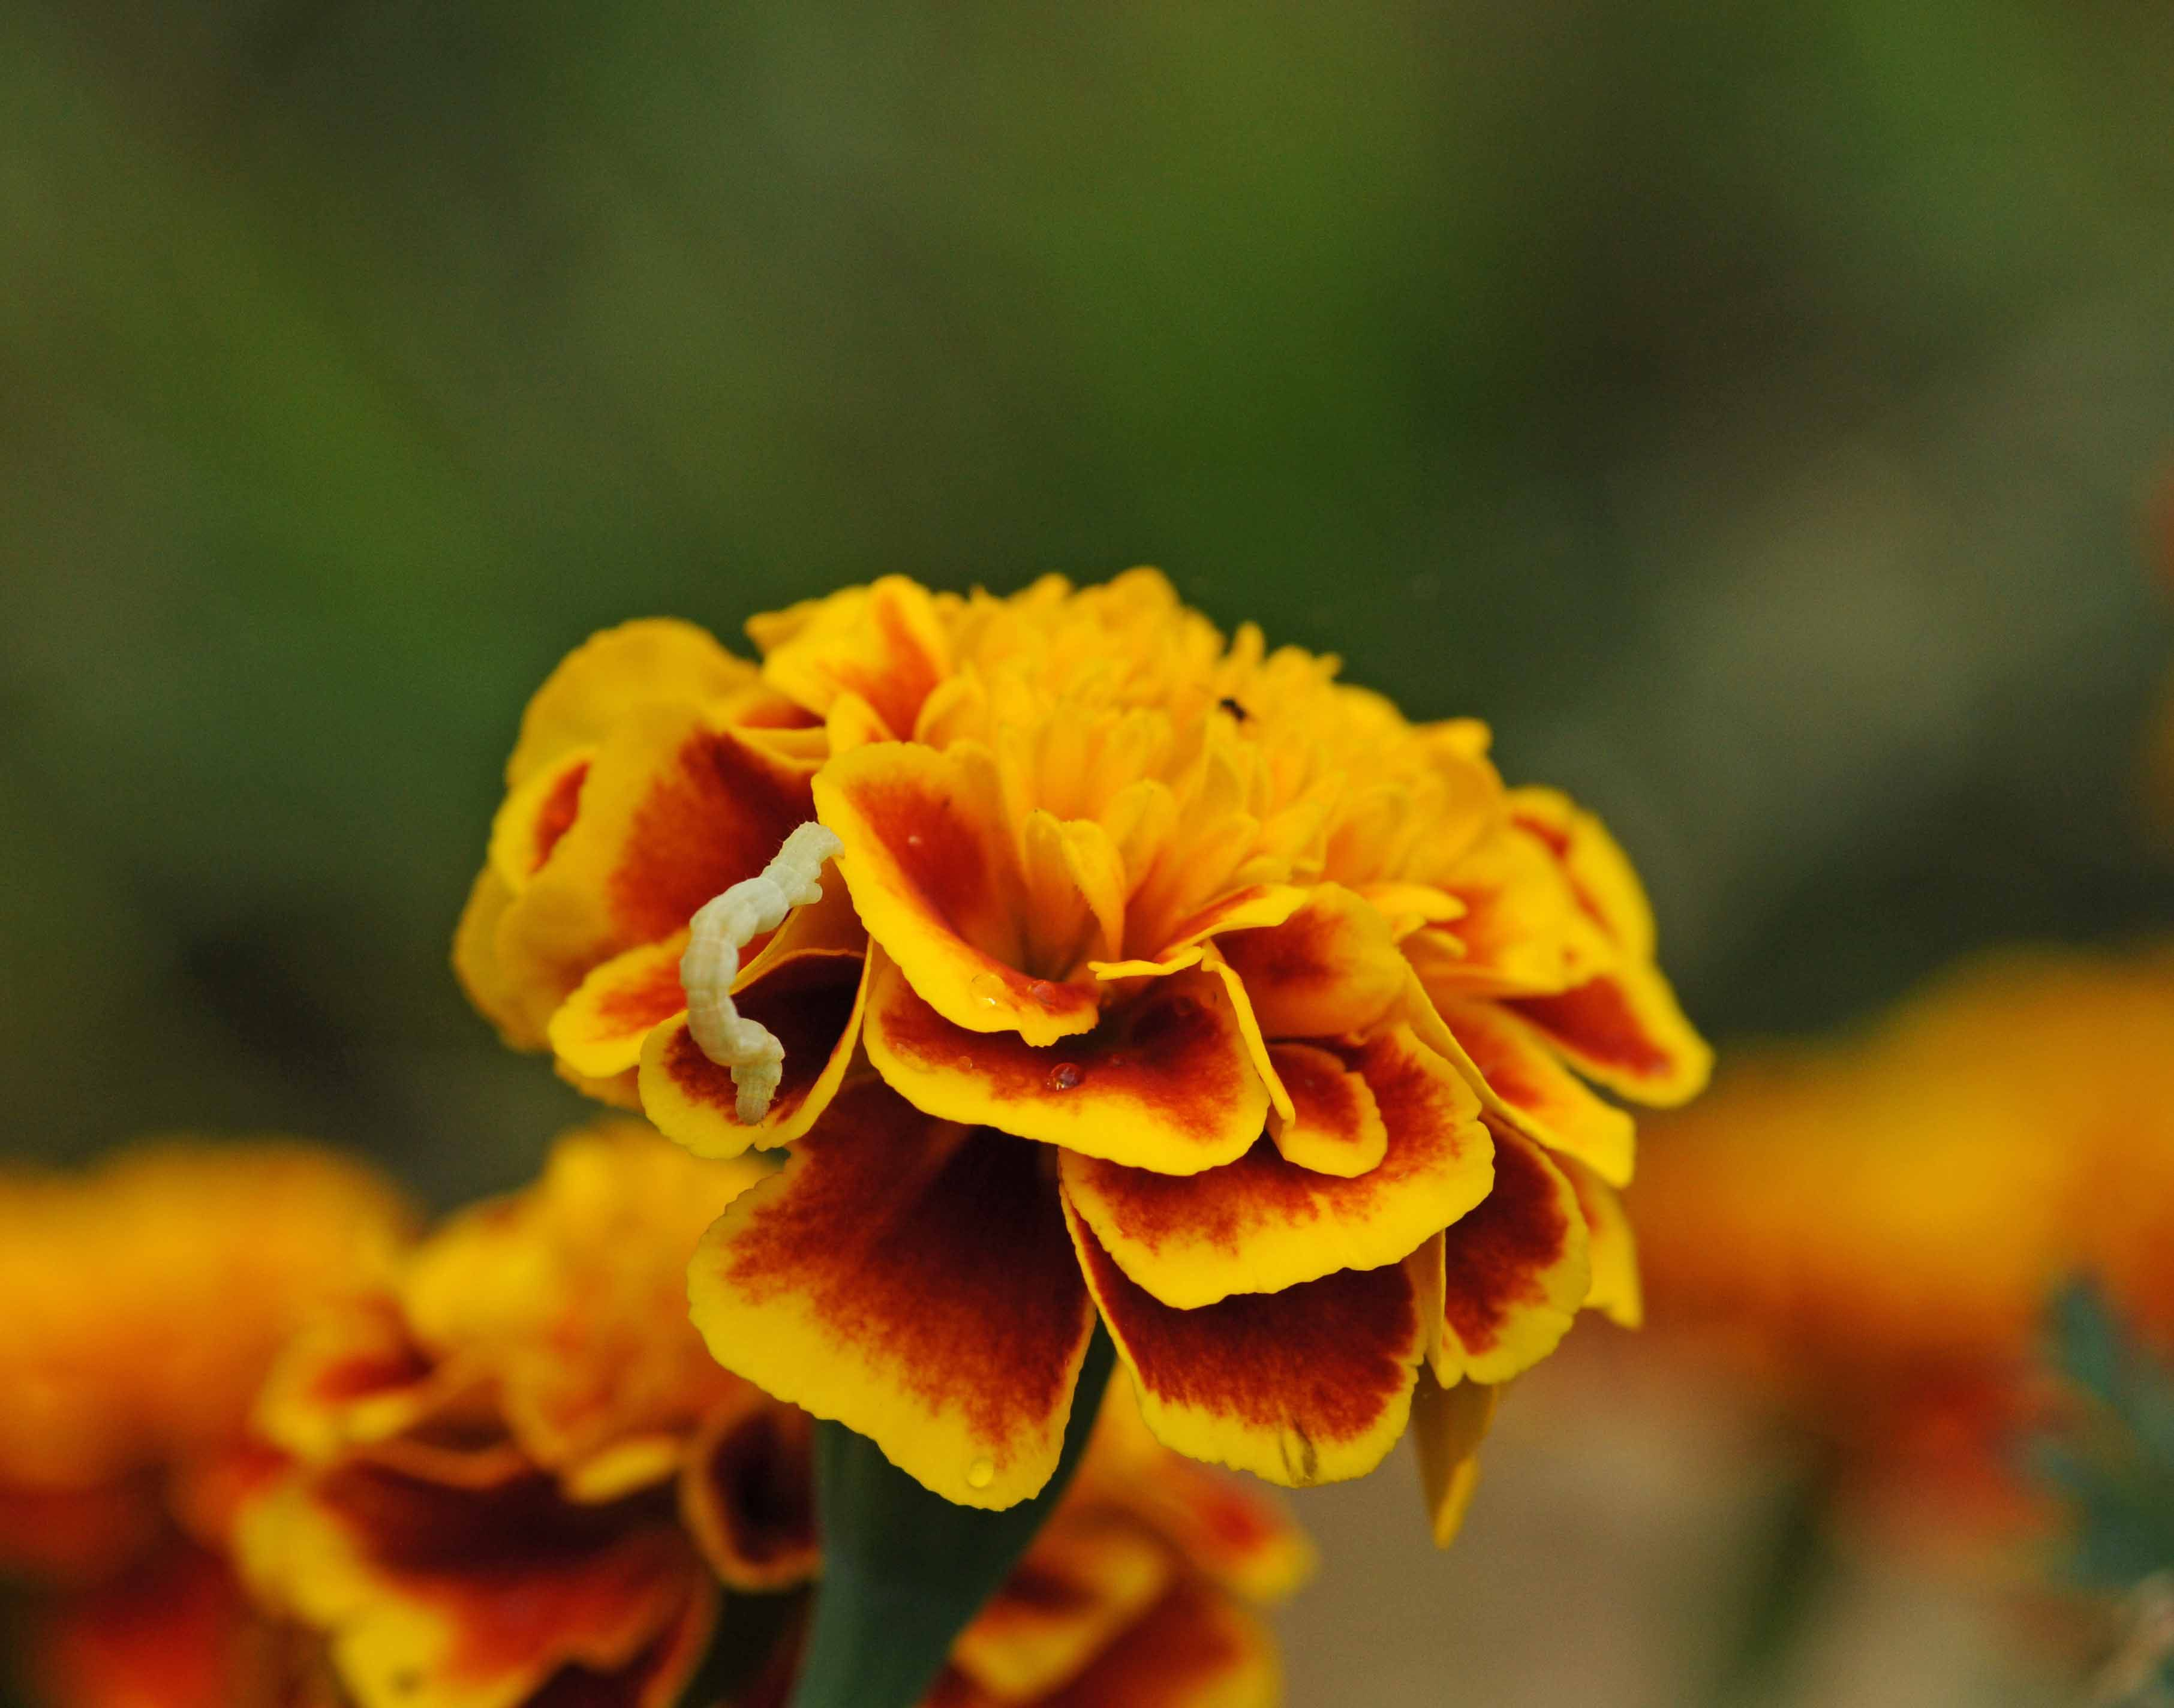 Inchworm on a Marigold Flowers, Plants, Garden